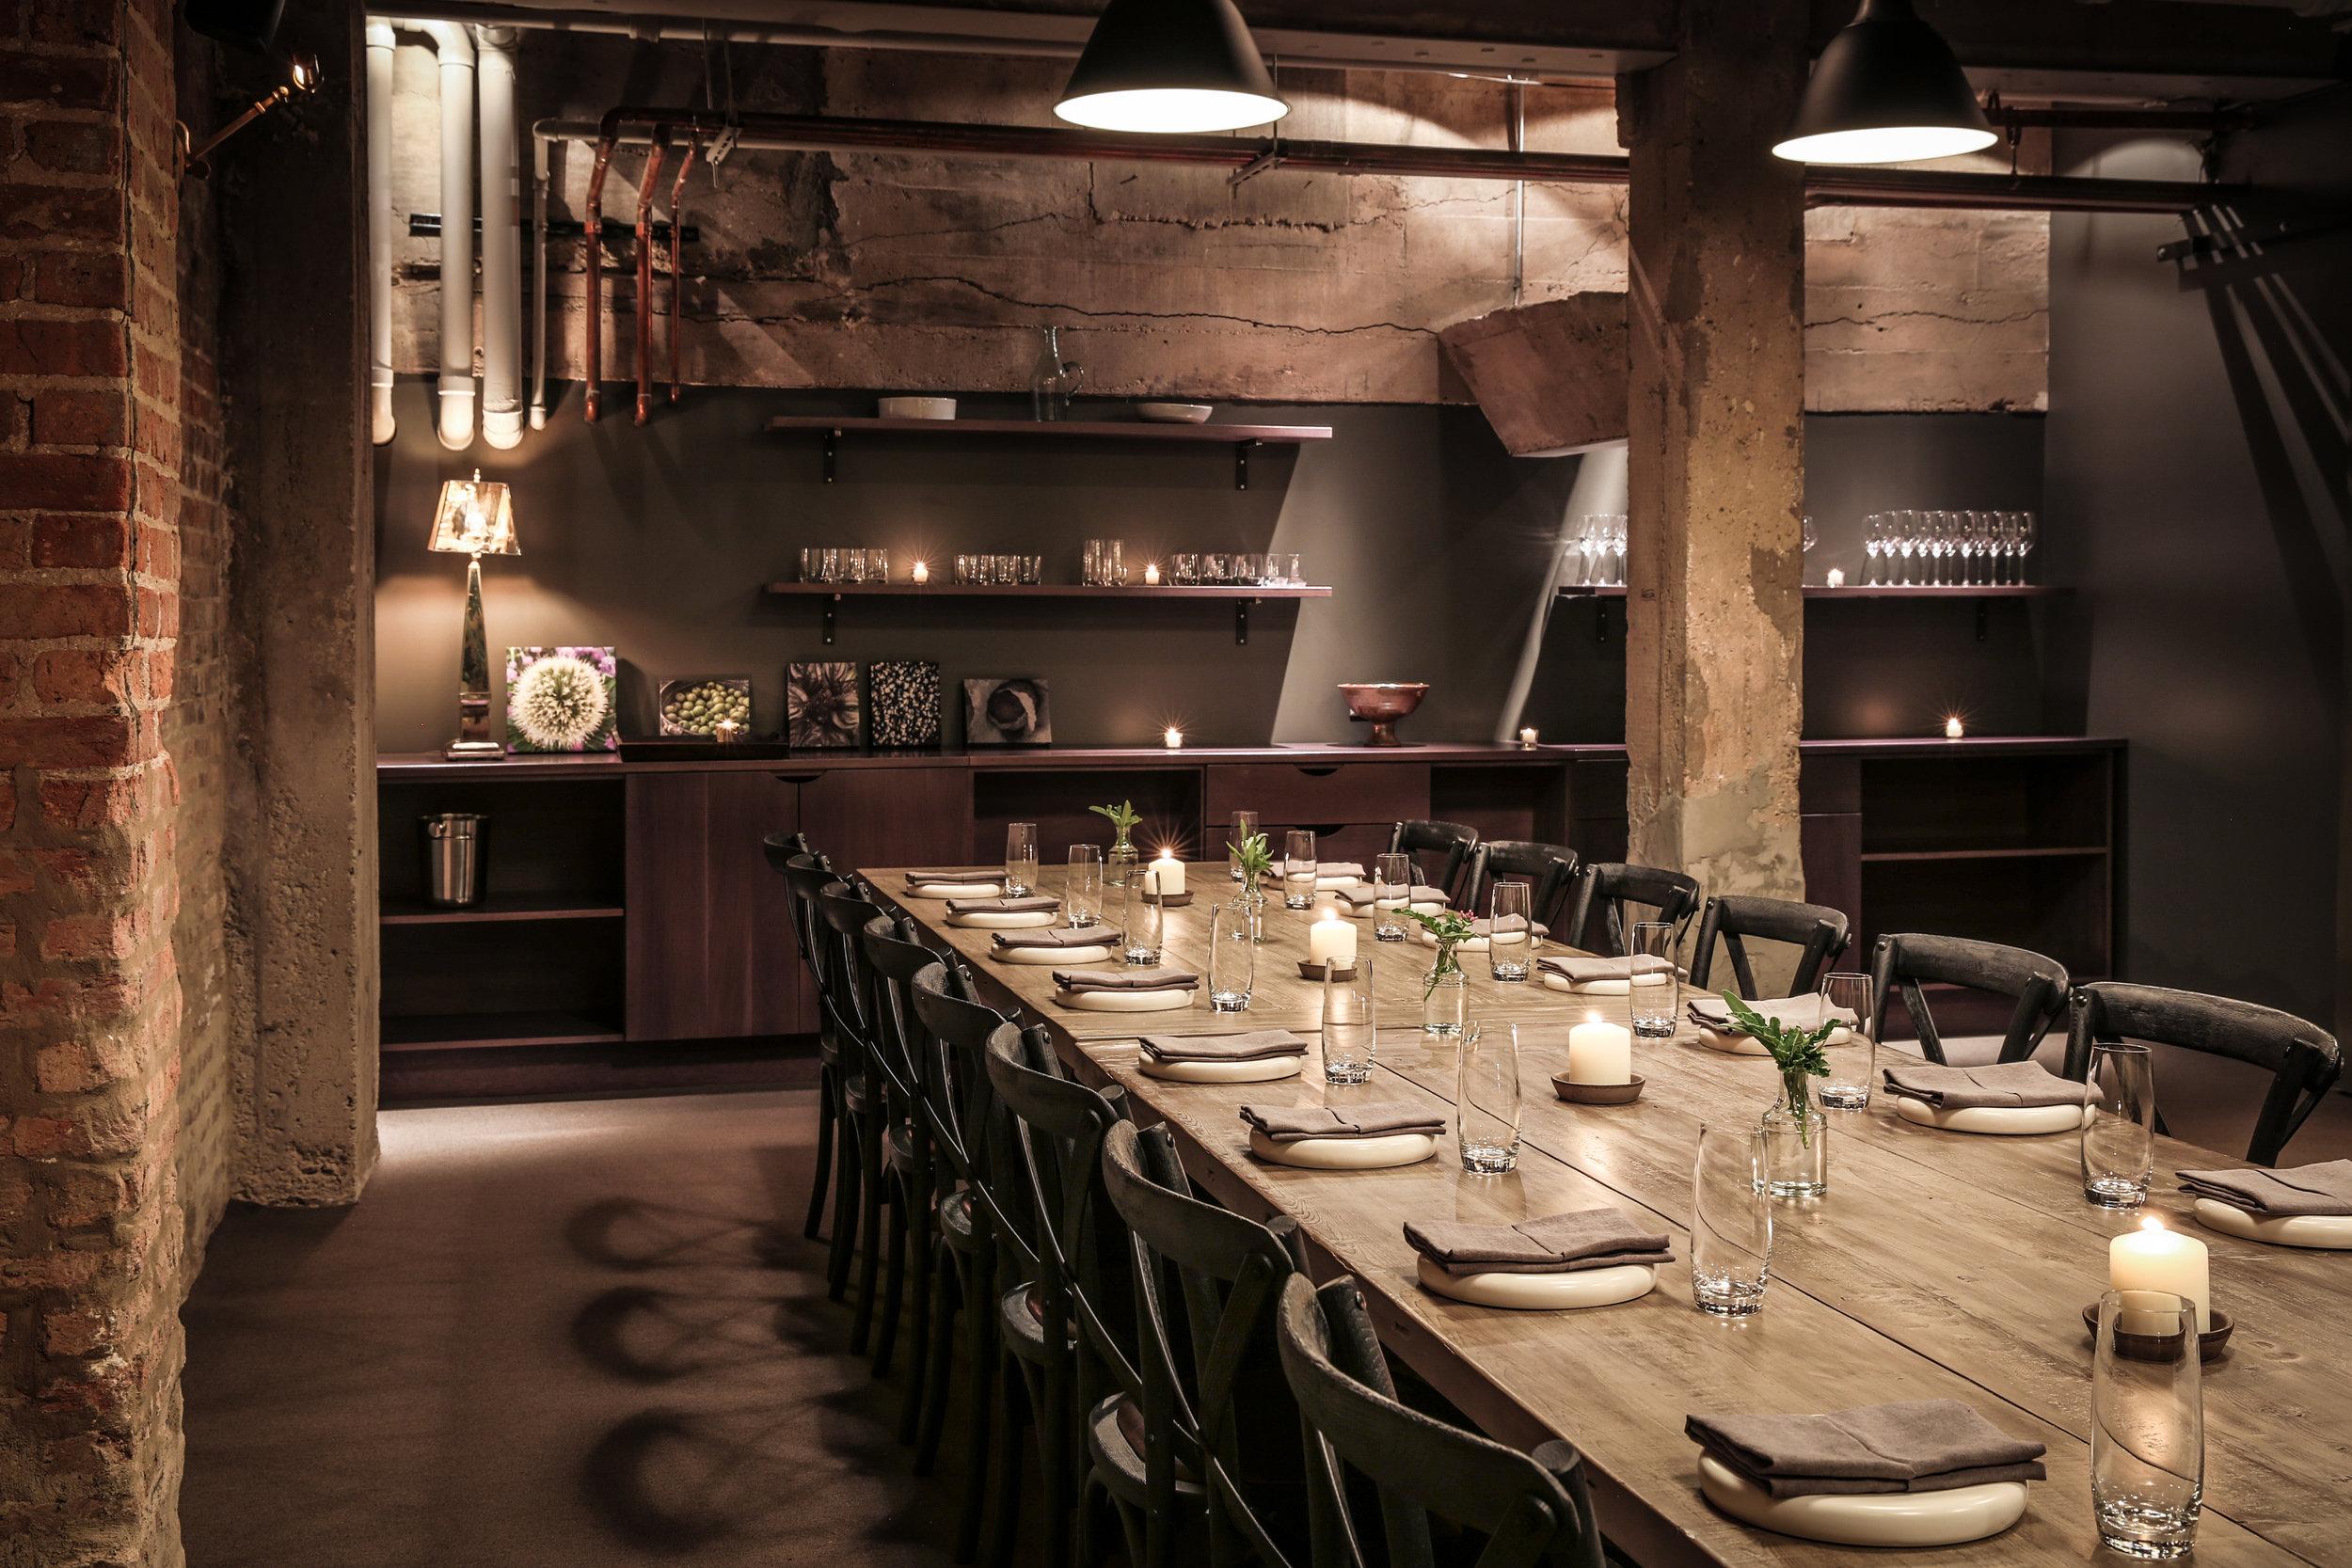 studio-saint-bars-and-restaurants-smyth-and-the-loyalist-washington-dc-21